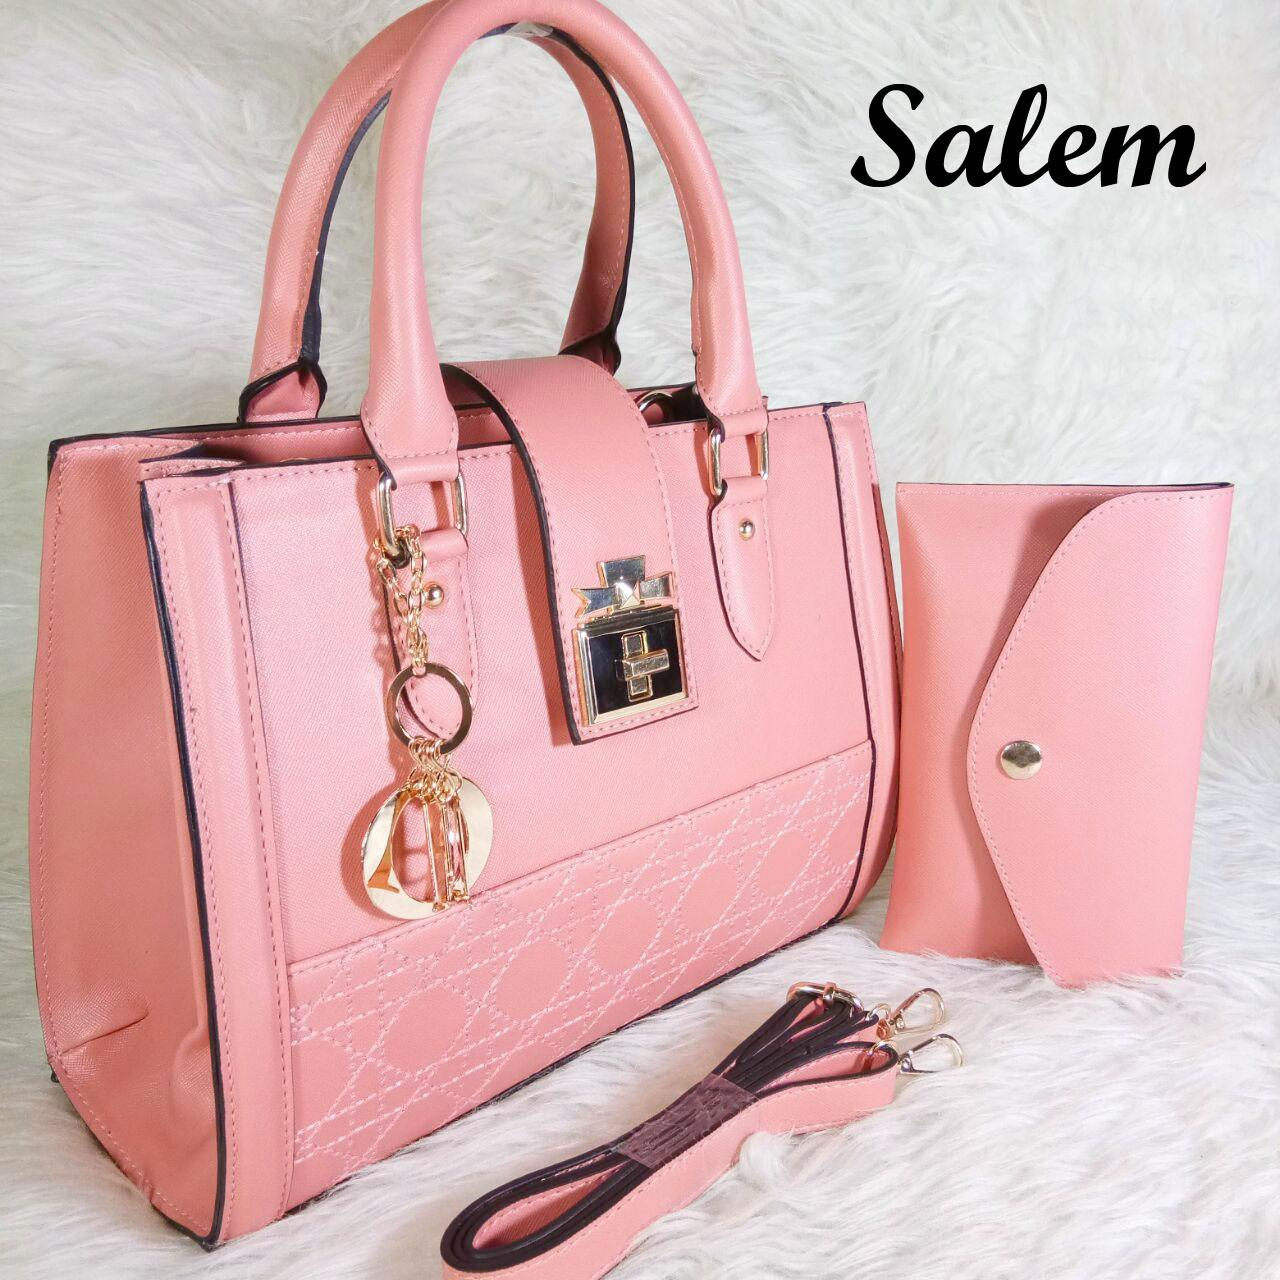 Dior victoria - Tas Wanita Set Dompet Murah Tas Batam Tas Import Korea  Modern Fashion Clutch 4d4b985aaa